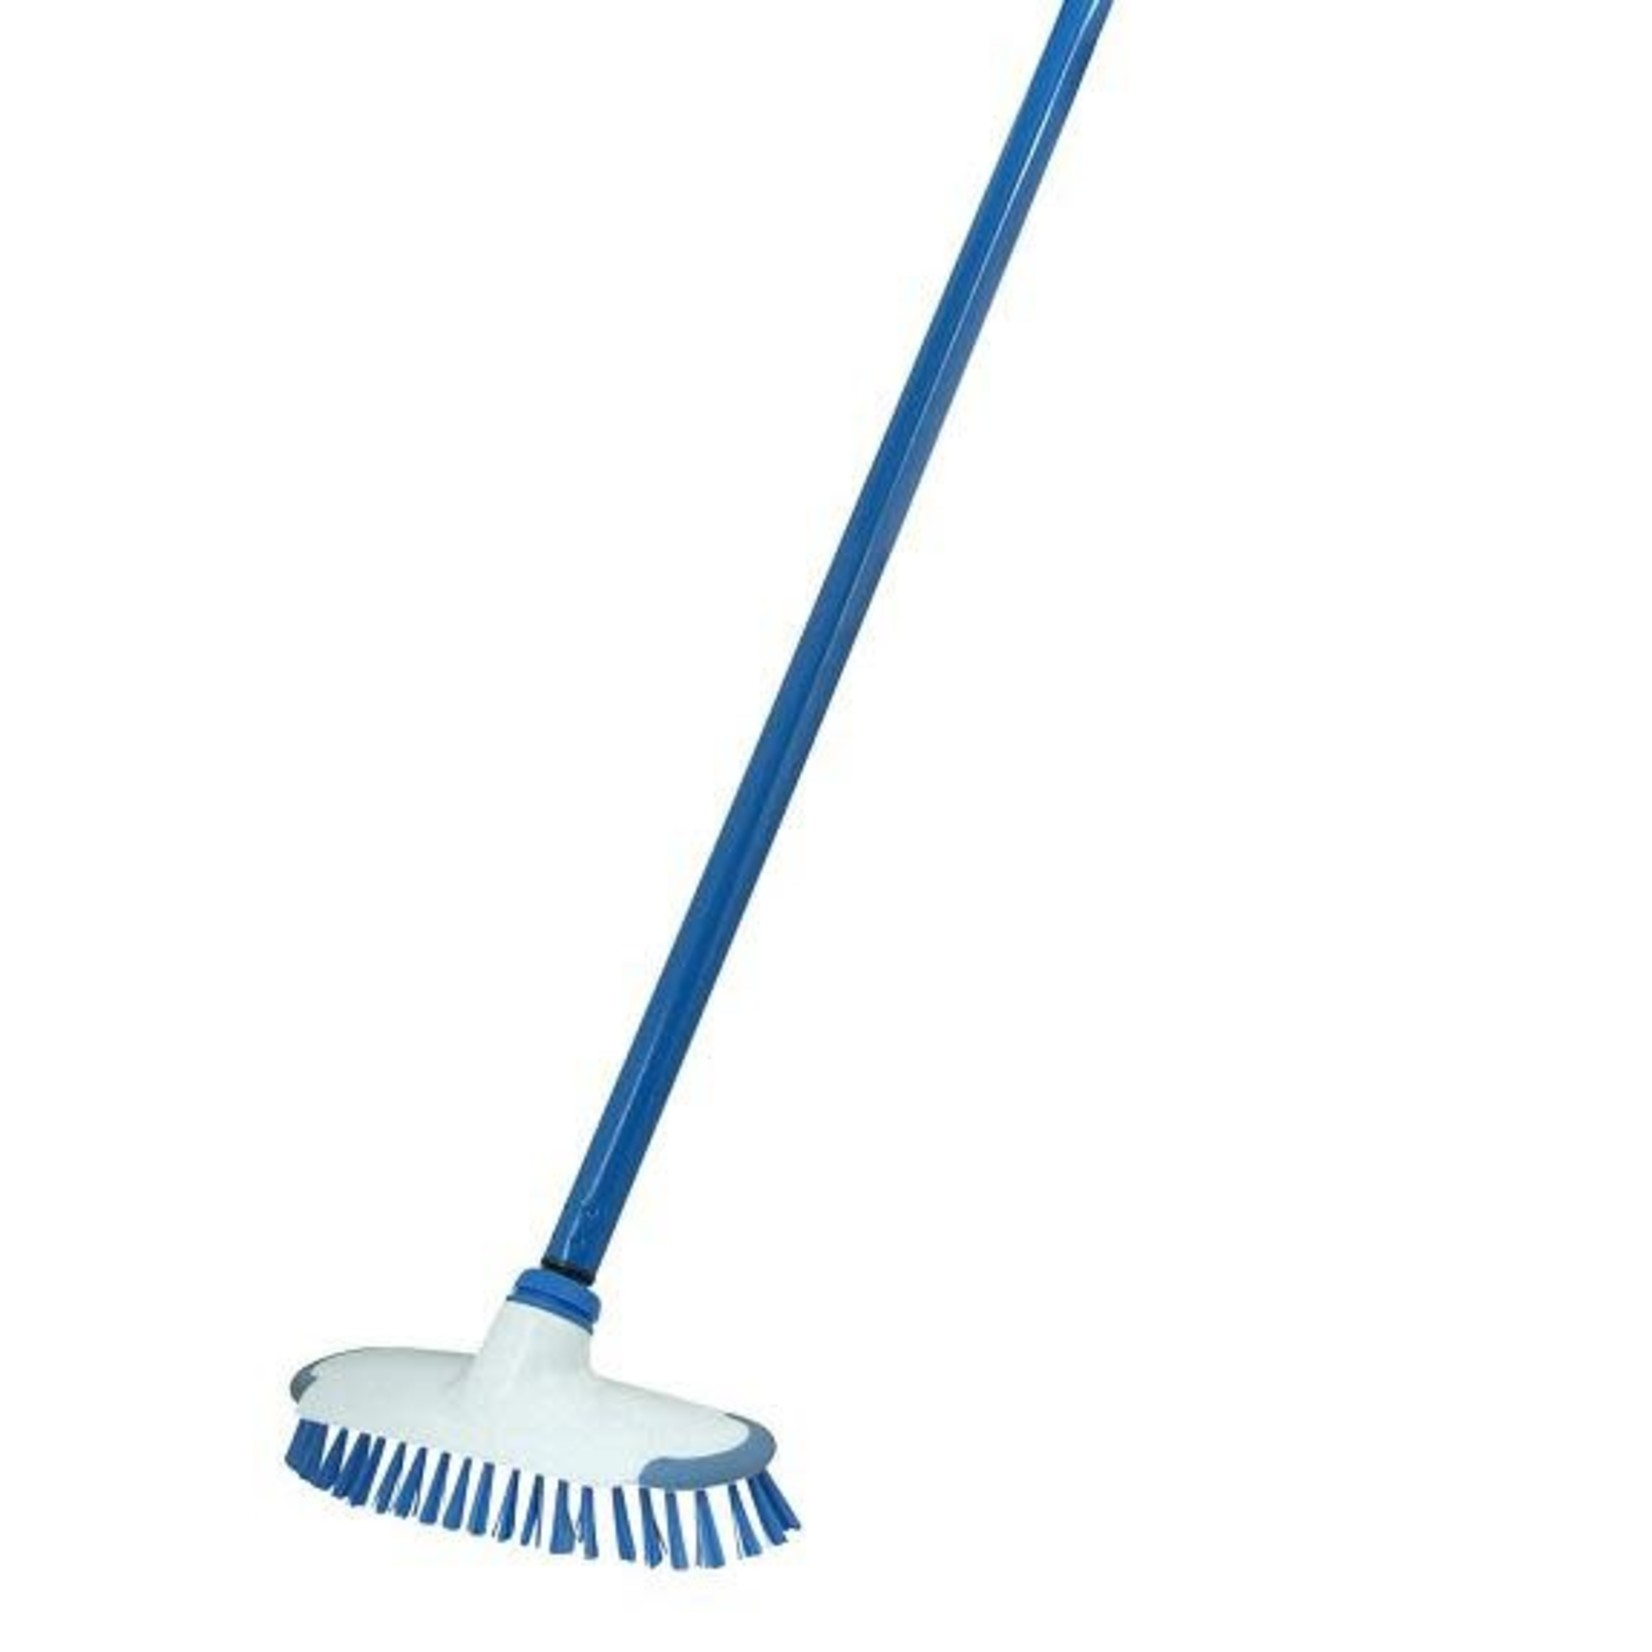 187 Blue/White Deck Scrubber